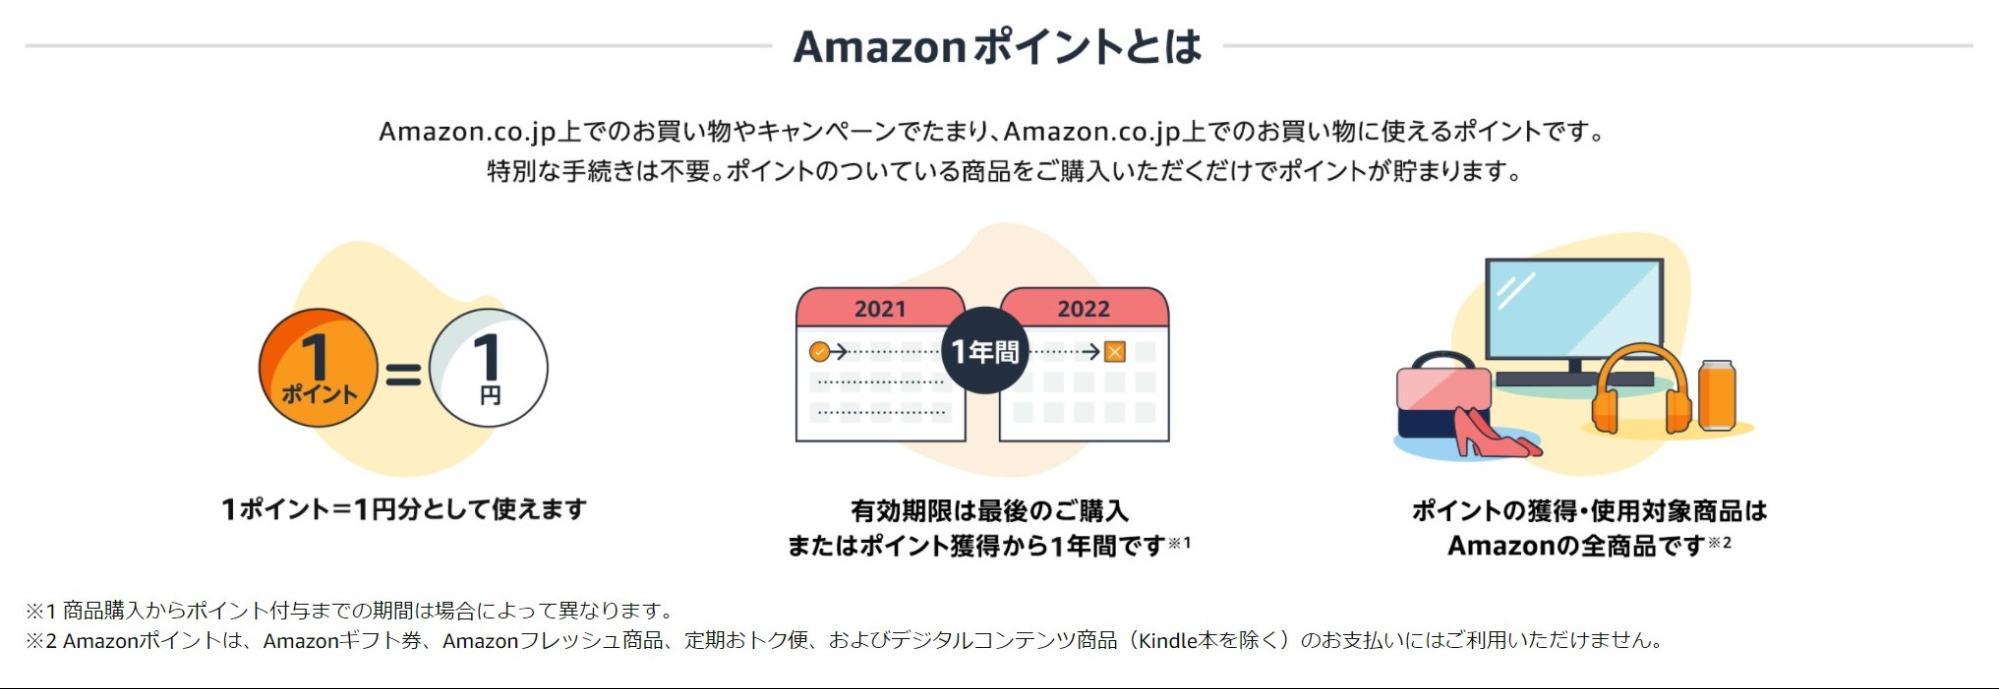 Amazonポイントとは